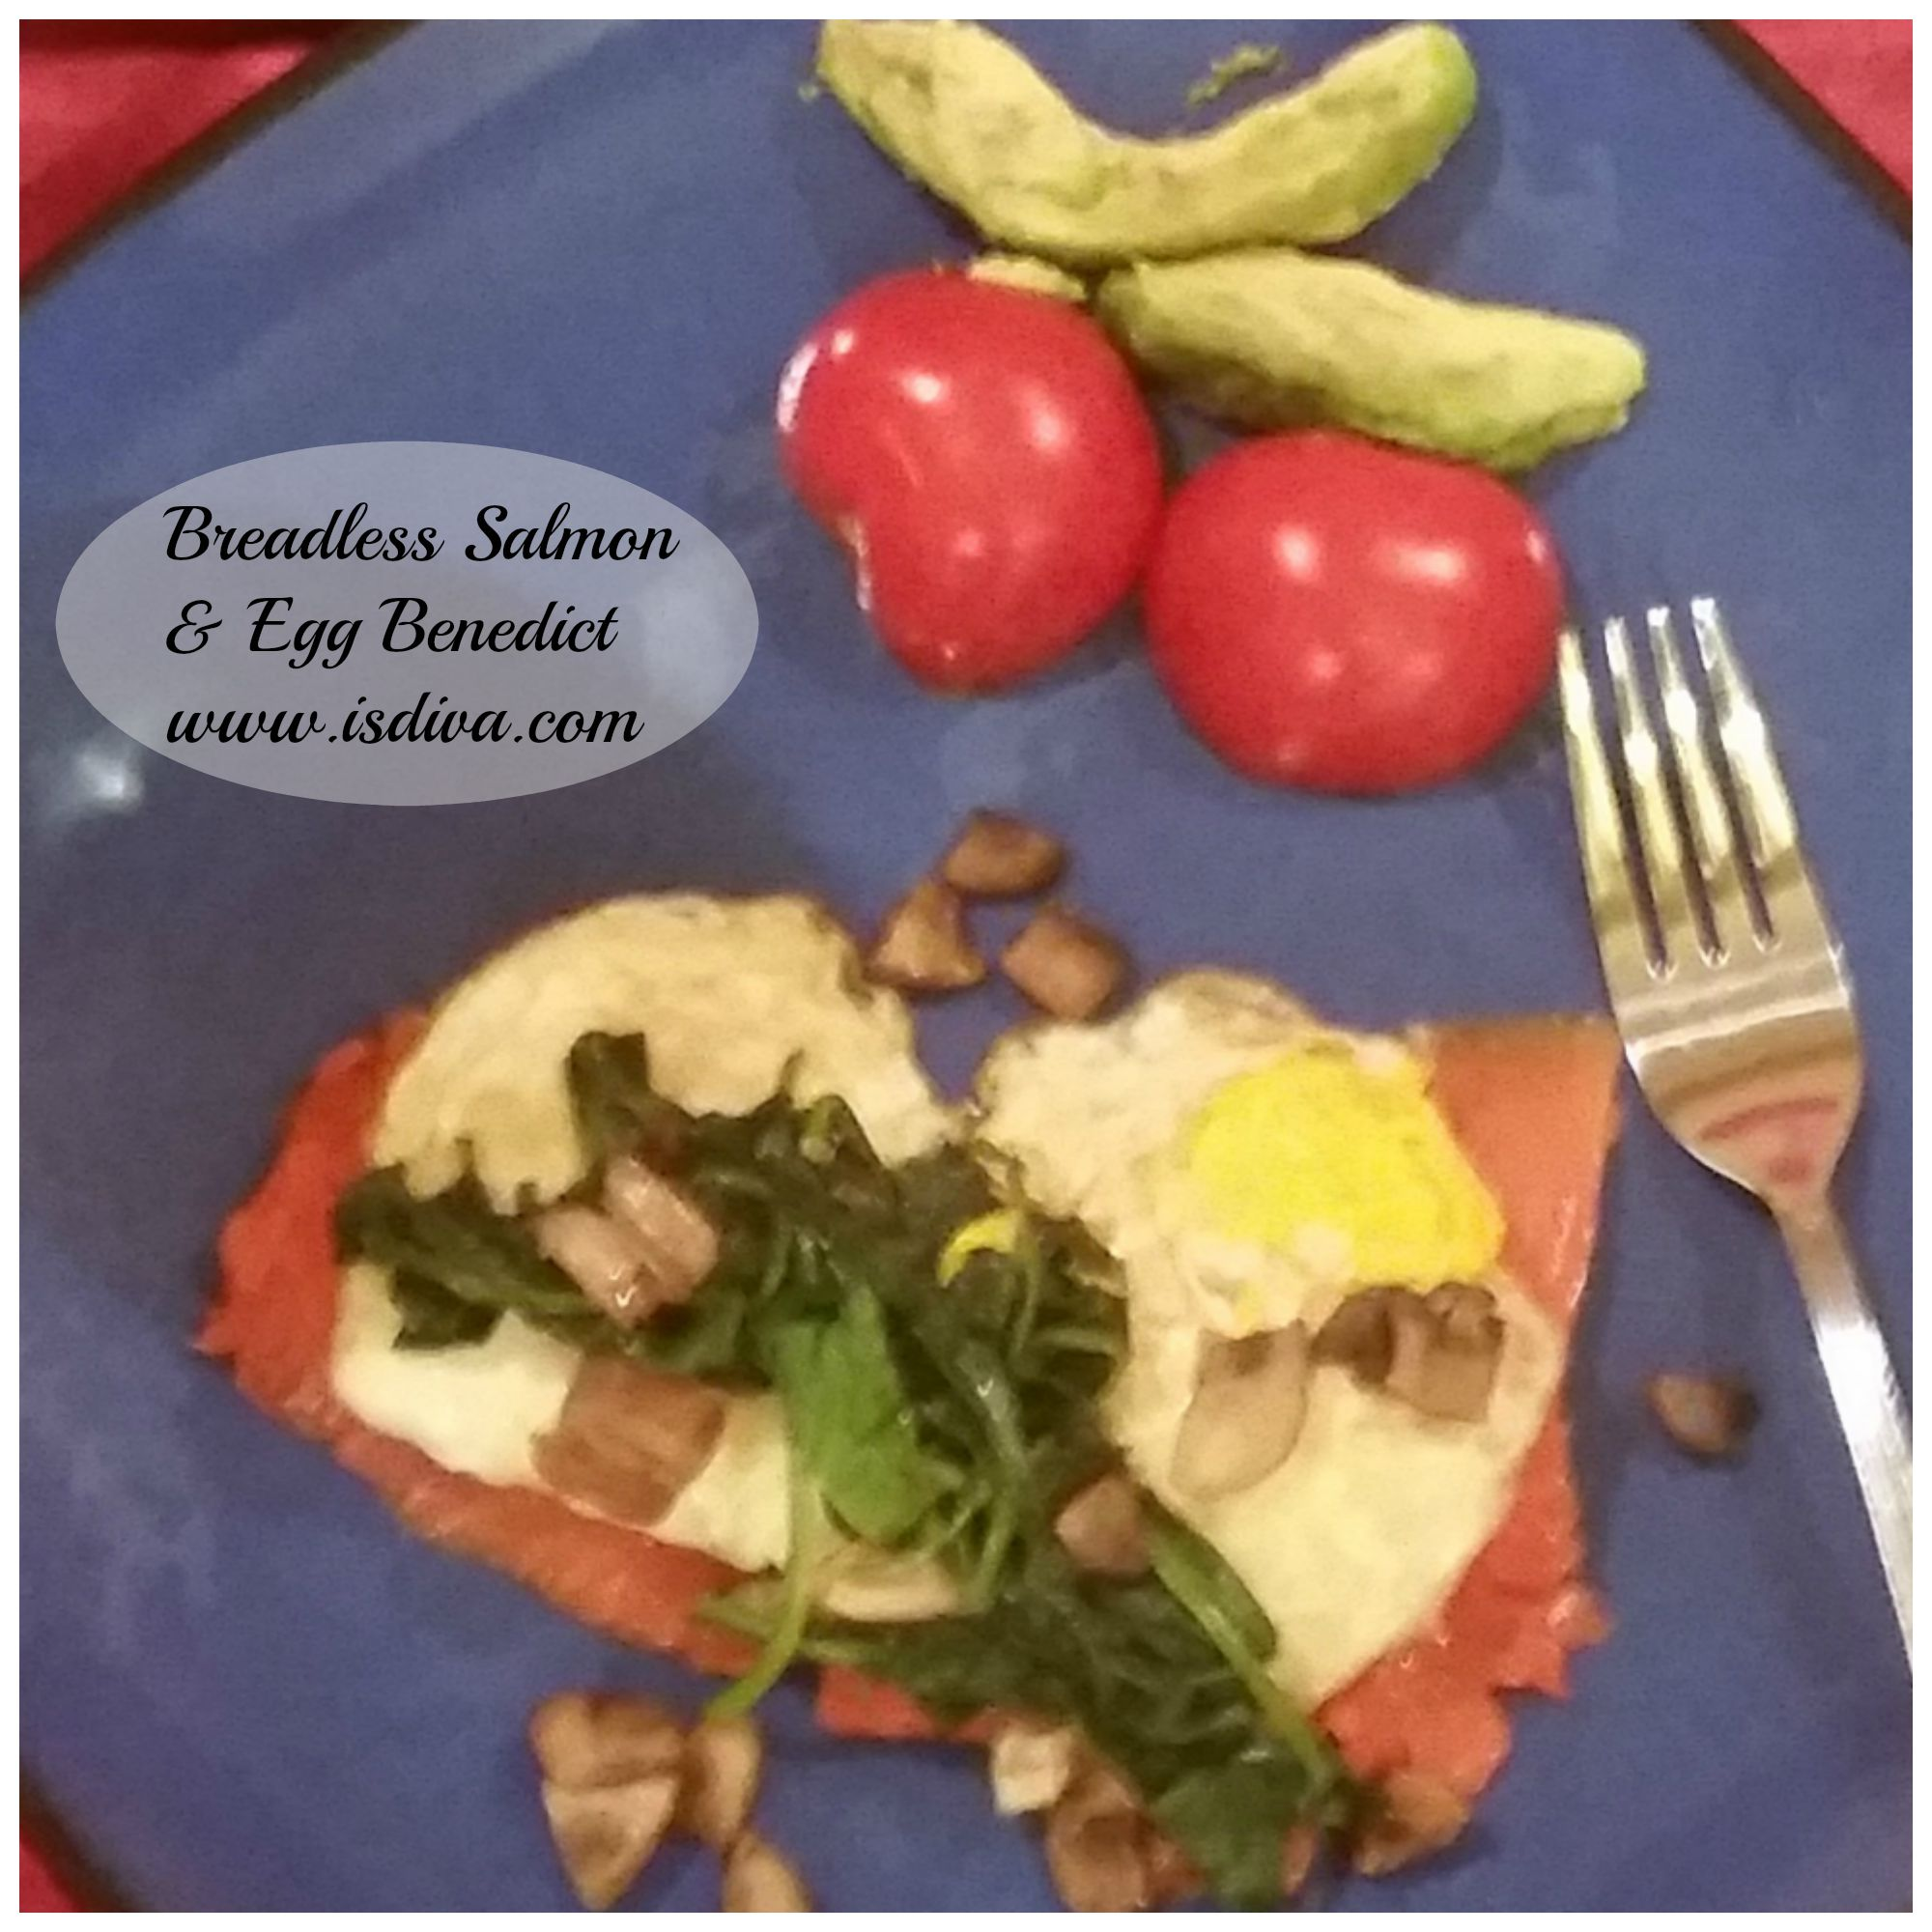 Breadless Salmon and Eggs Benedict